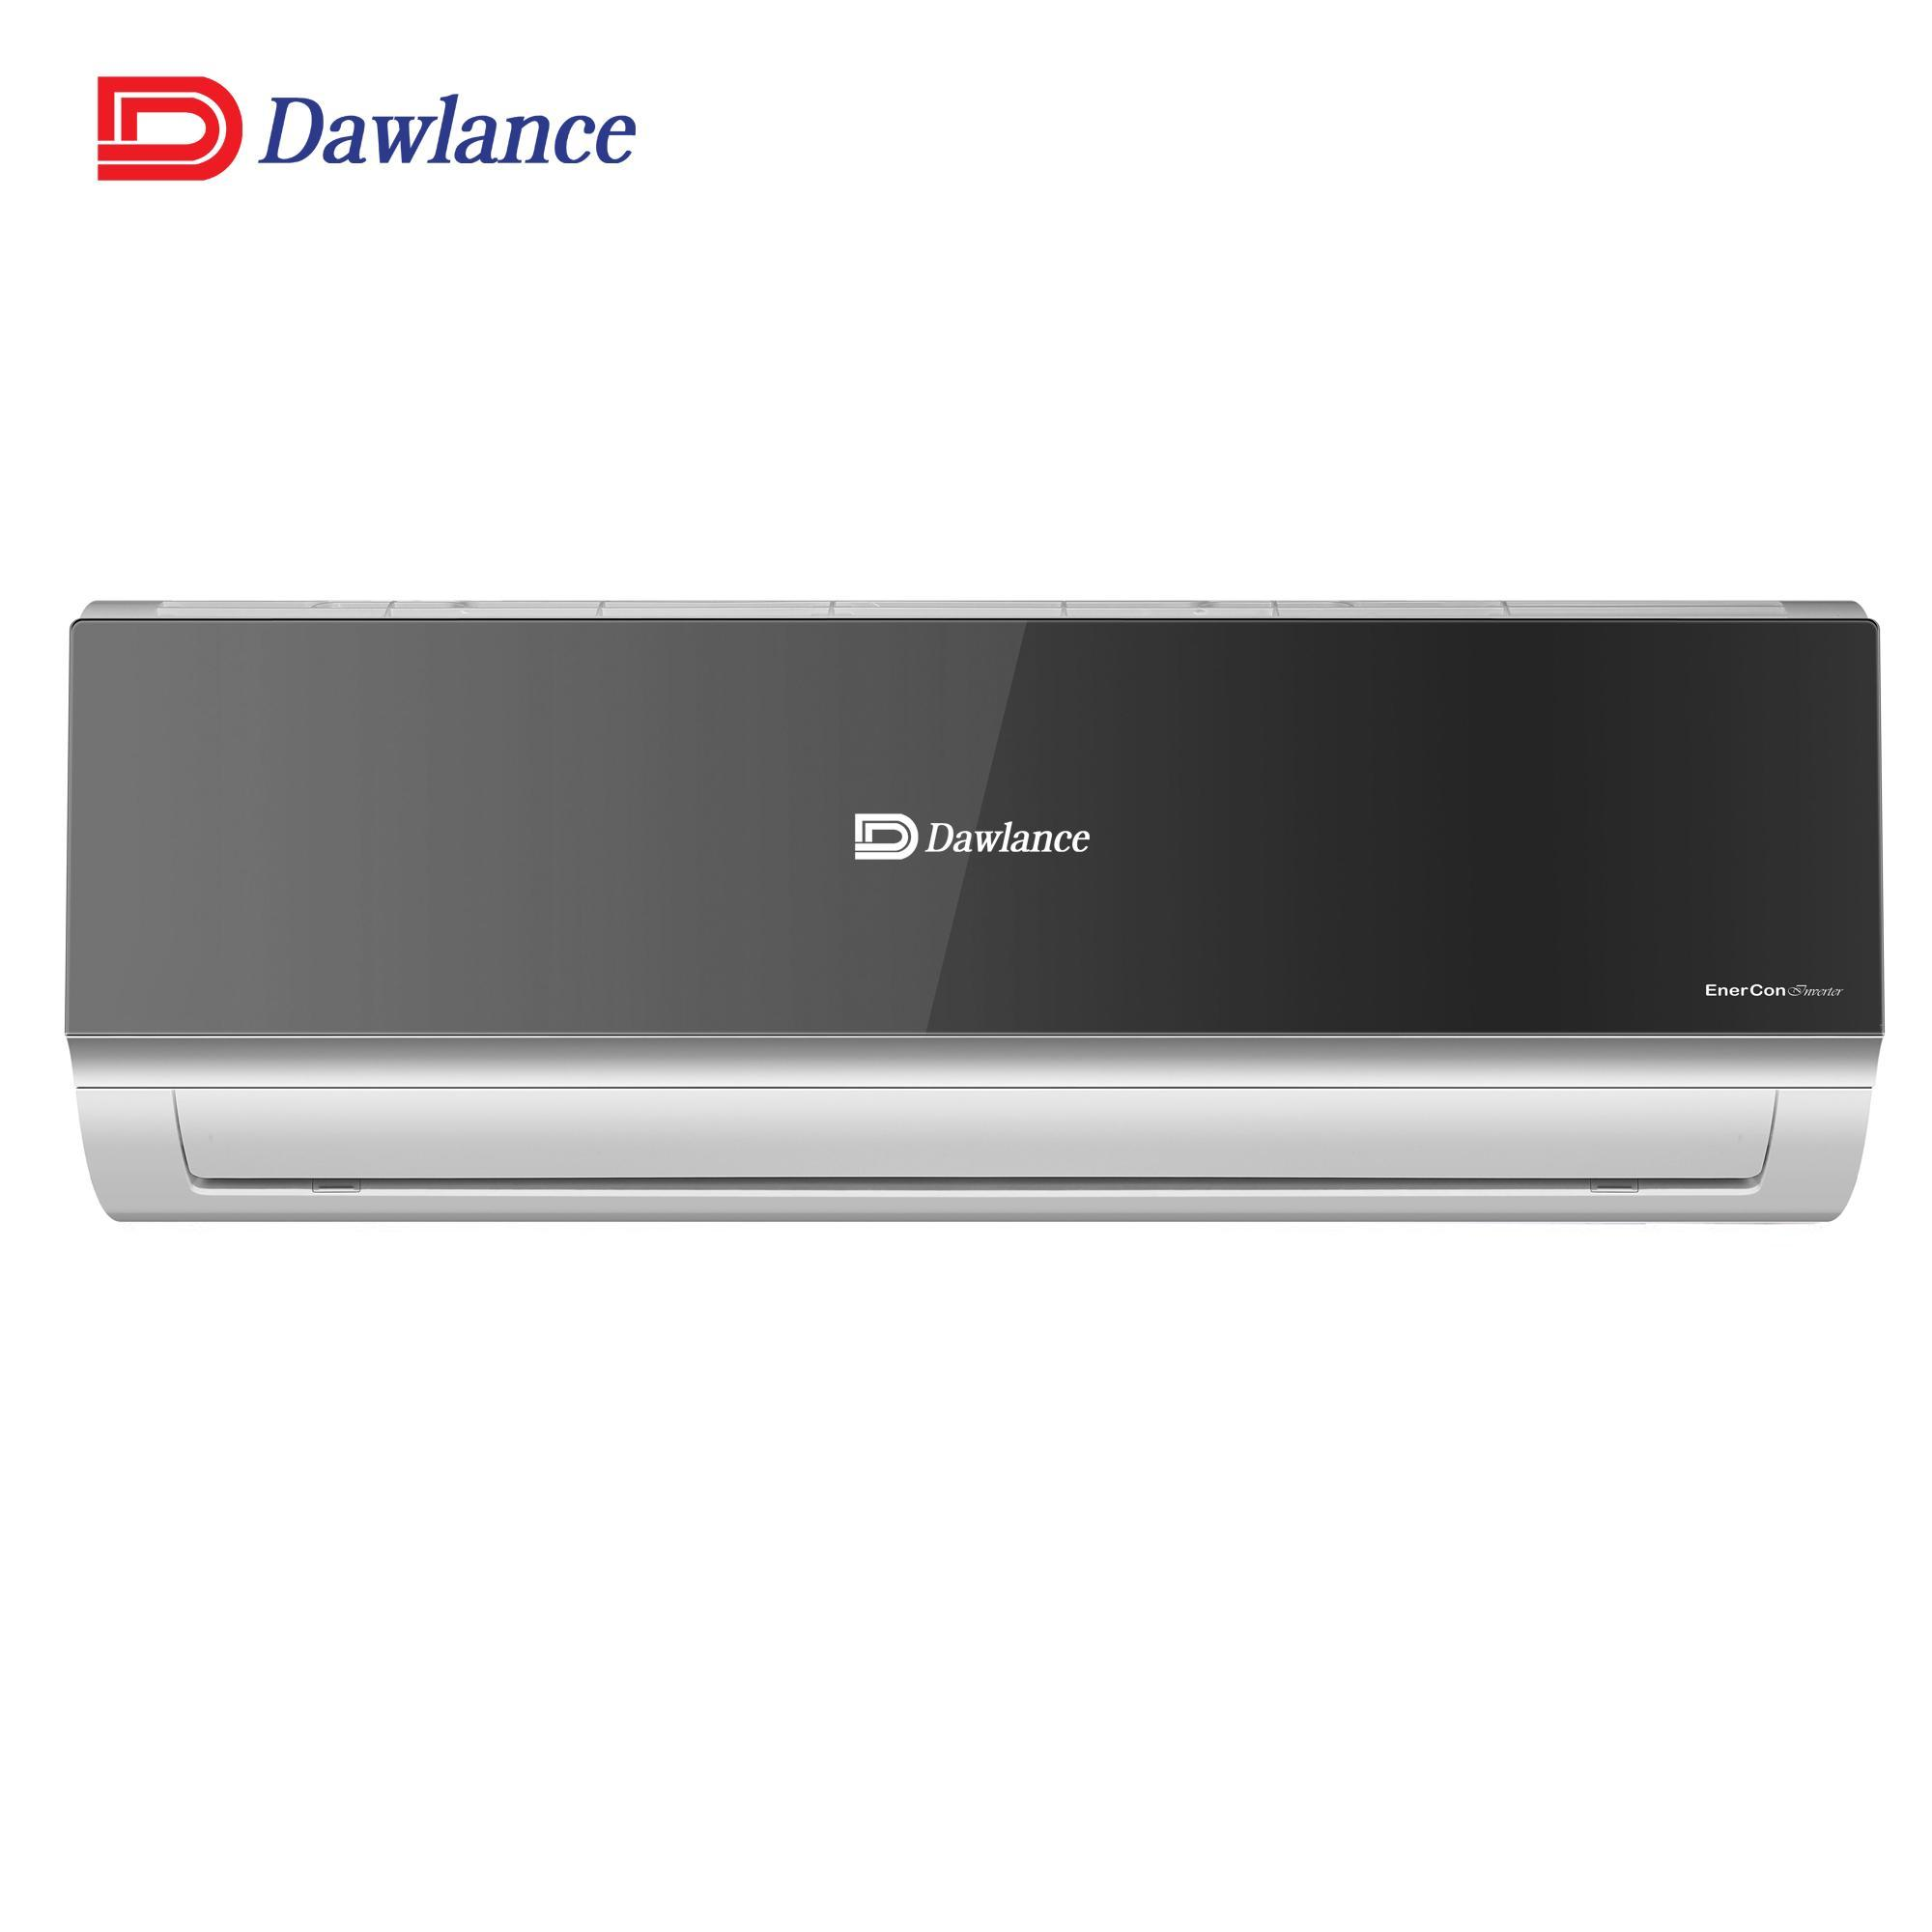 Dawlance Enercon 30 Inverter 1 5 Ton Price In Pakistan Price Updated Sep 2020